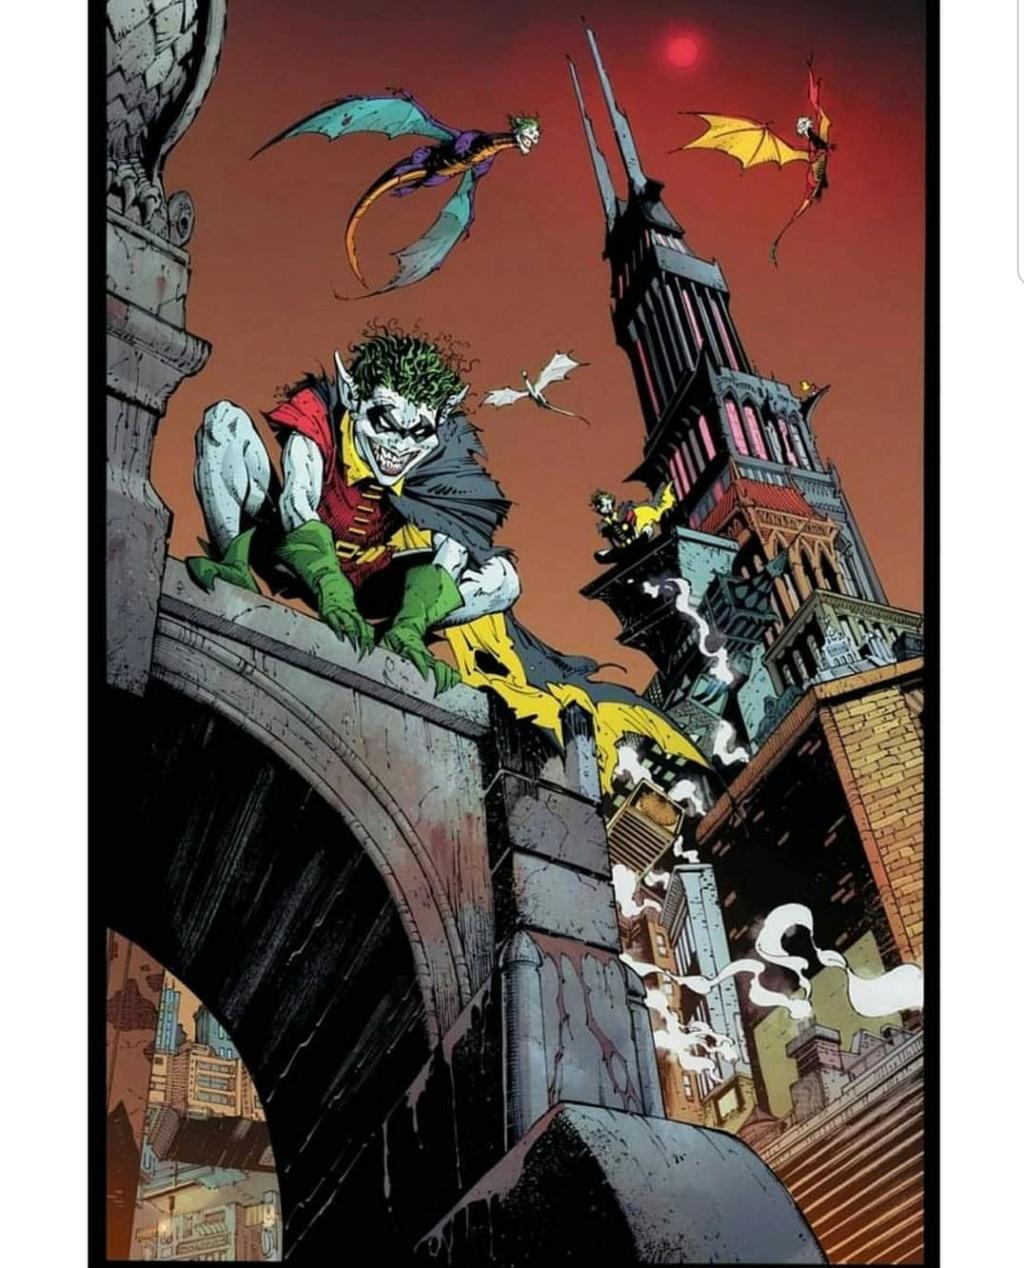 [DC COMICS] Publicaciones Universo DC: Discusión General v2 - Página 16 20200315